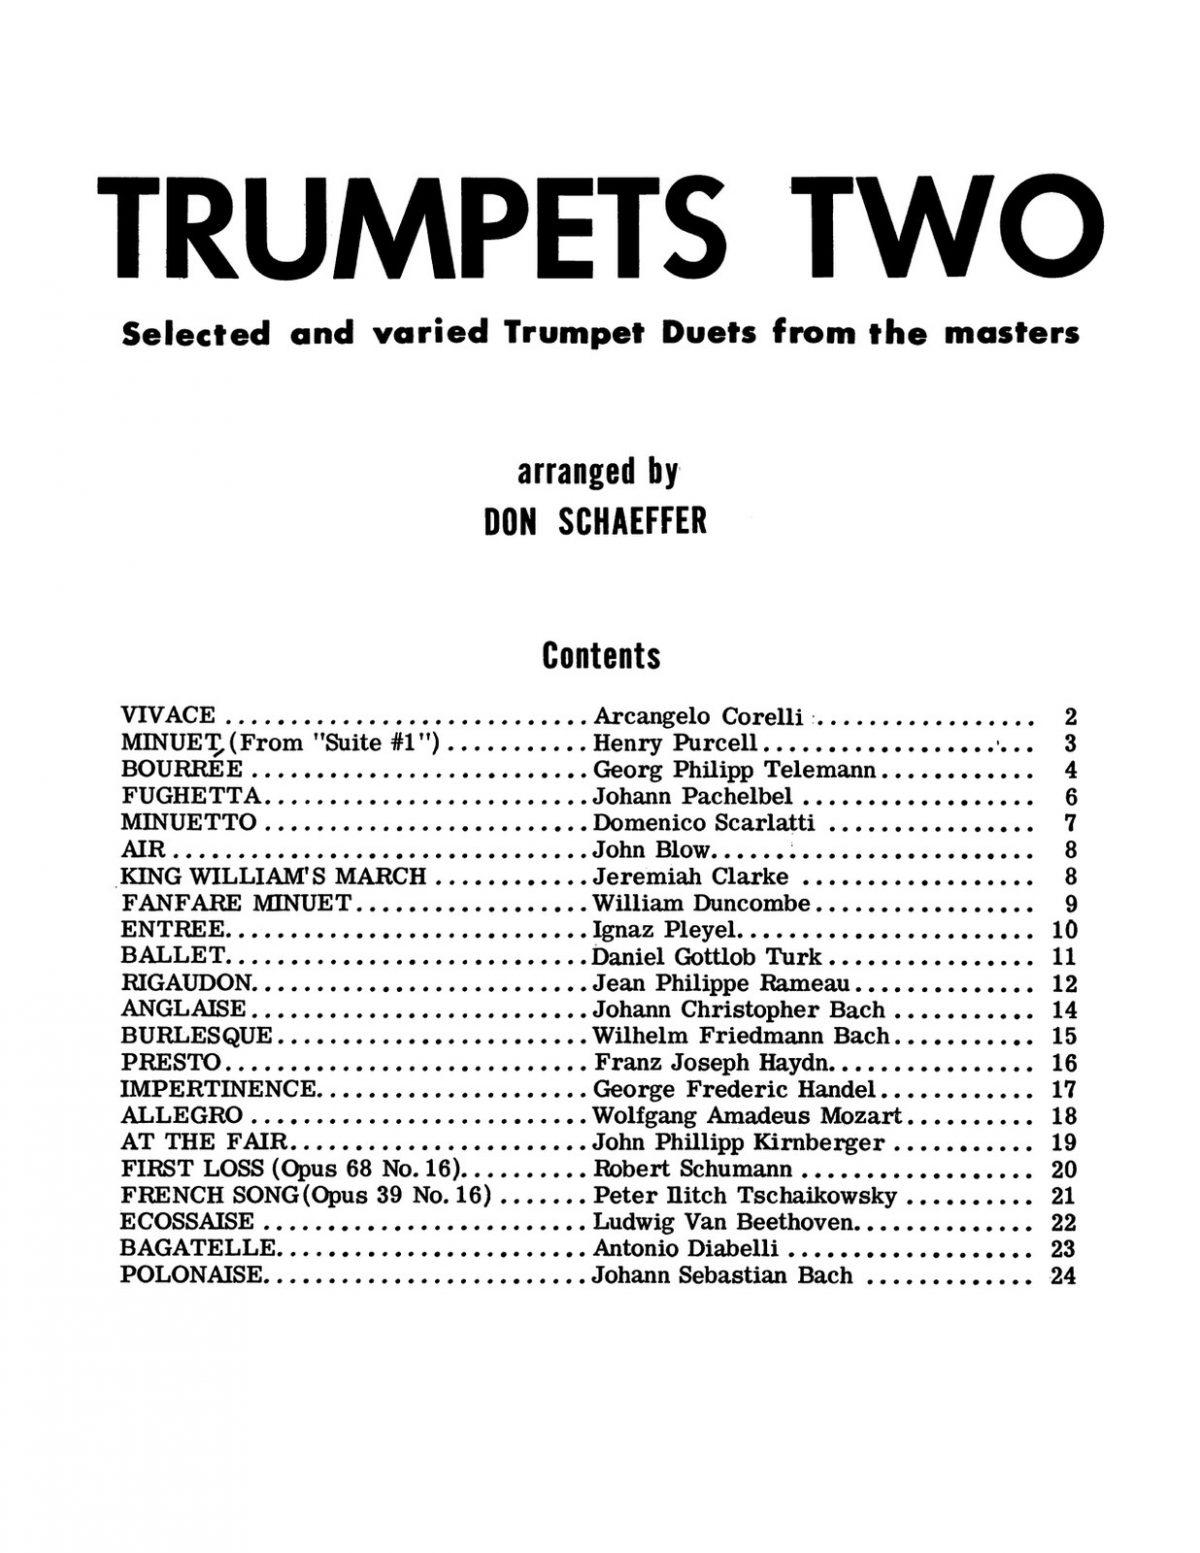 Schaeffer, Trumpets Two-p03